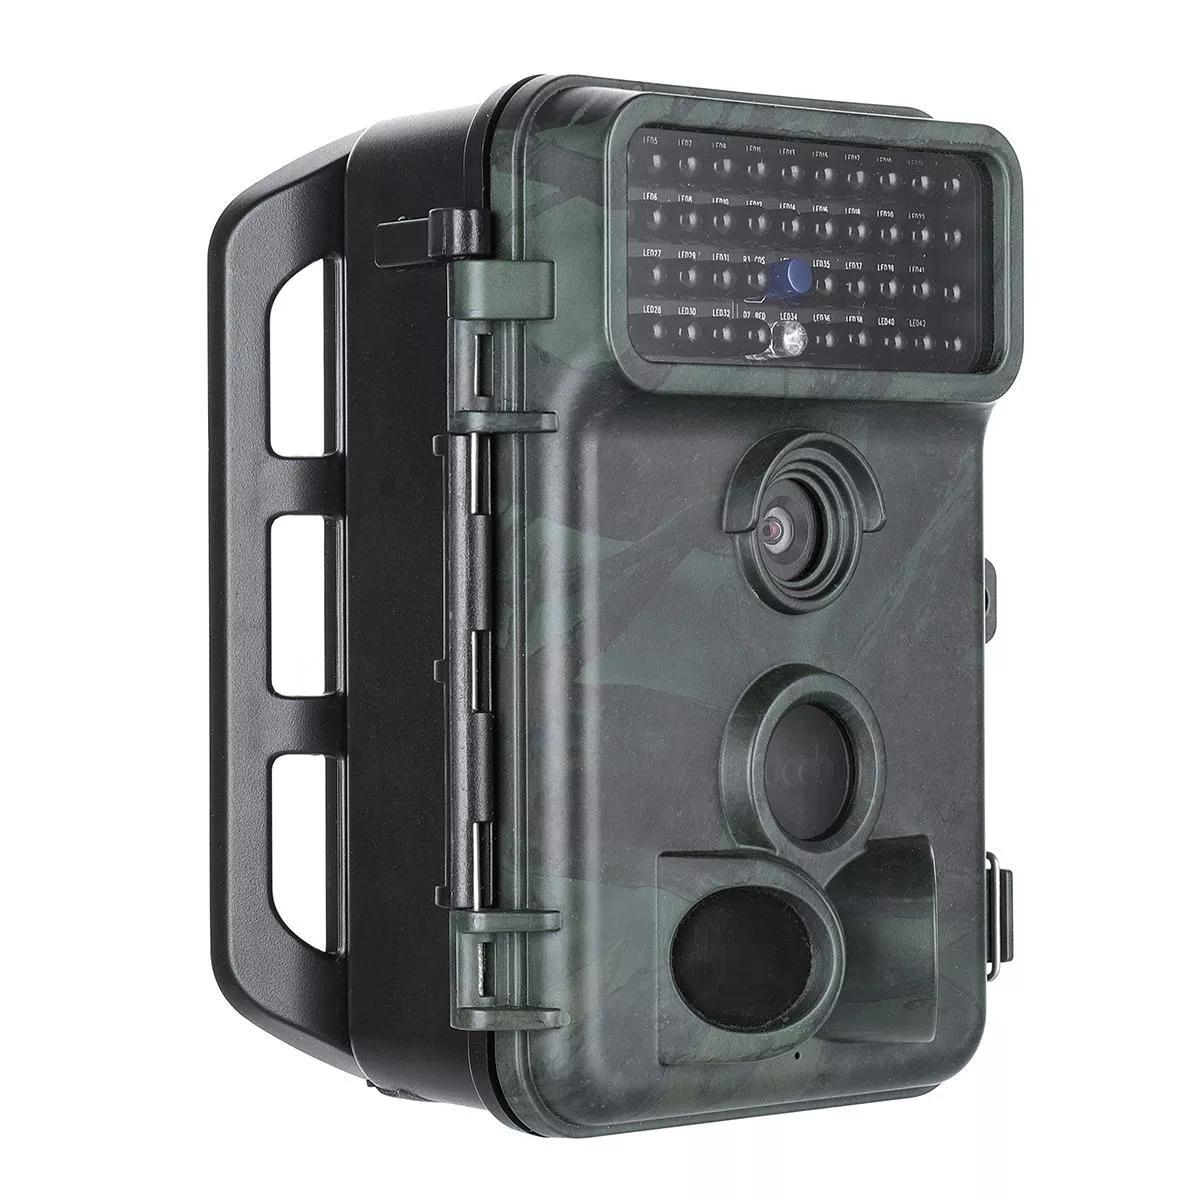 KALOAD Hunting Camera Motion Activated H801 16MP Deer Tree Digital Waterproof Trail Wildlife Camera - 4